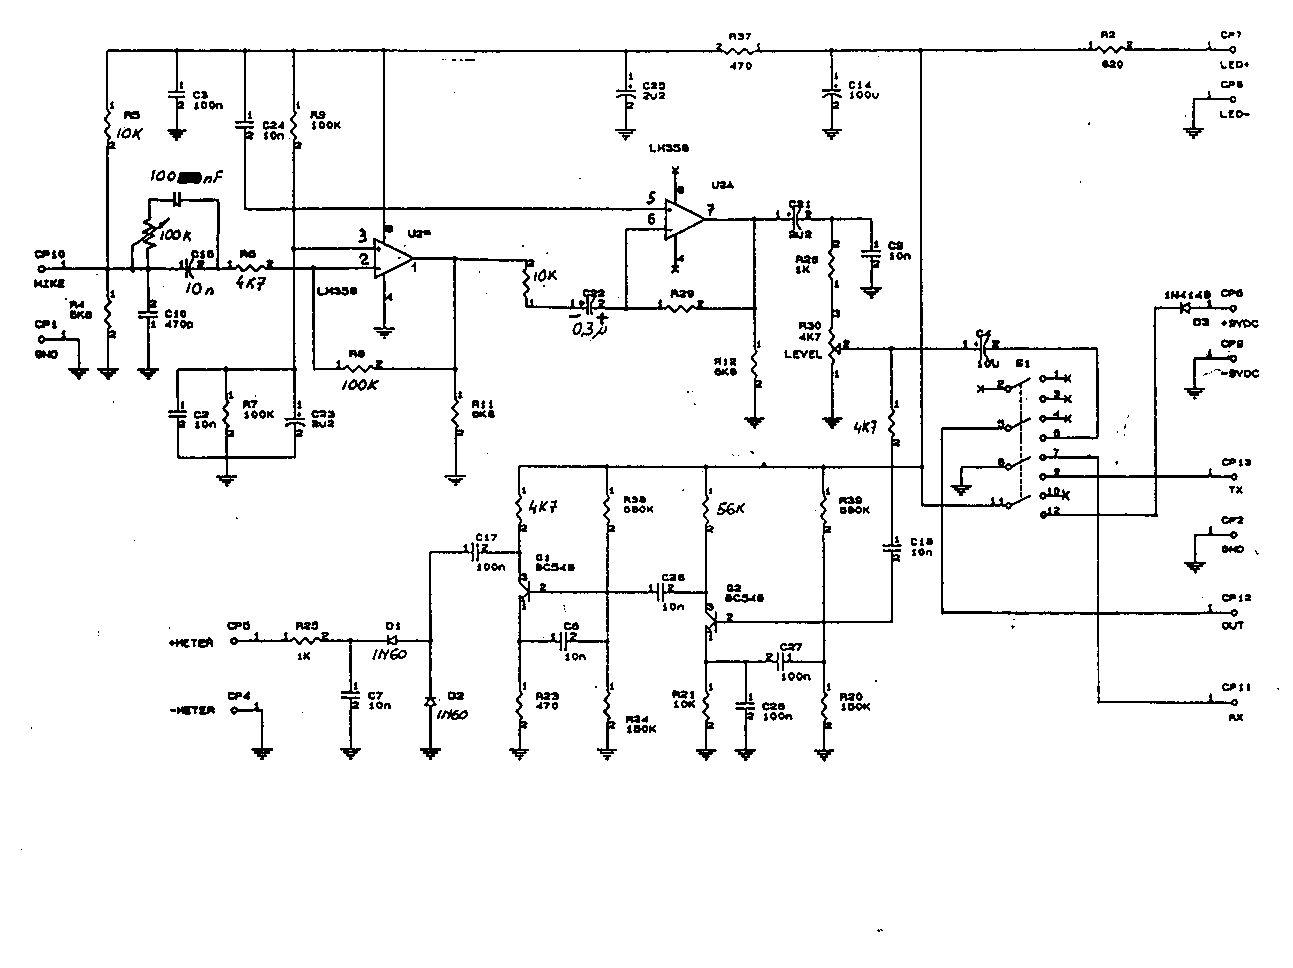 Schema Collegamento Equalizzatore Ad Amplificatore : Mikrofon zetagi mb brak wkładki w mikrofonie